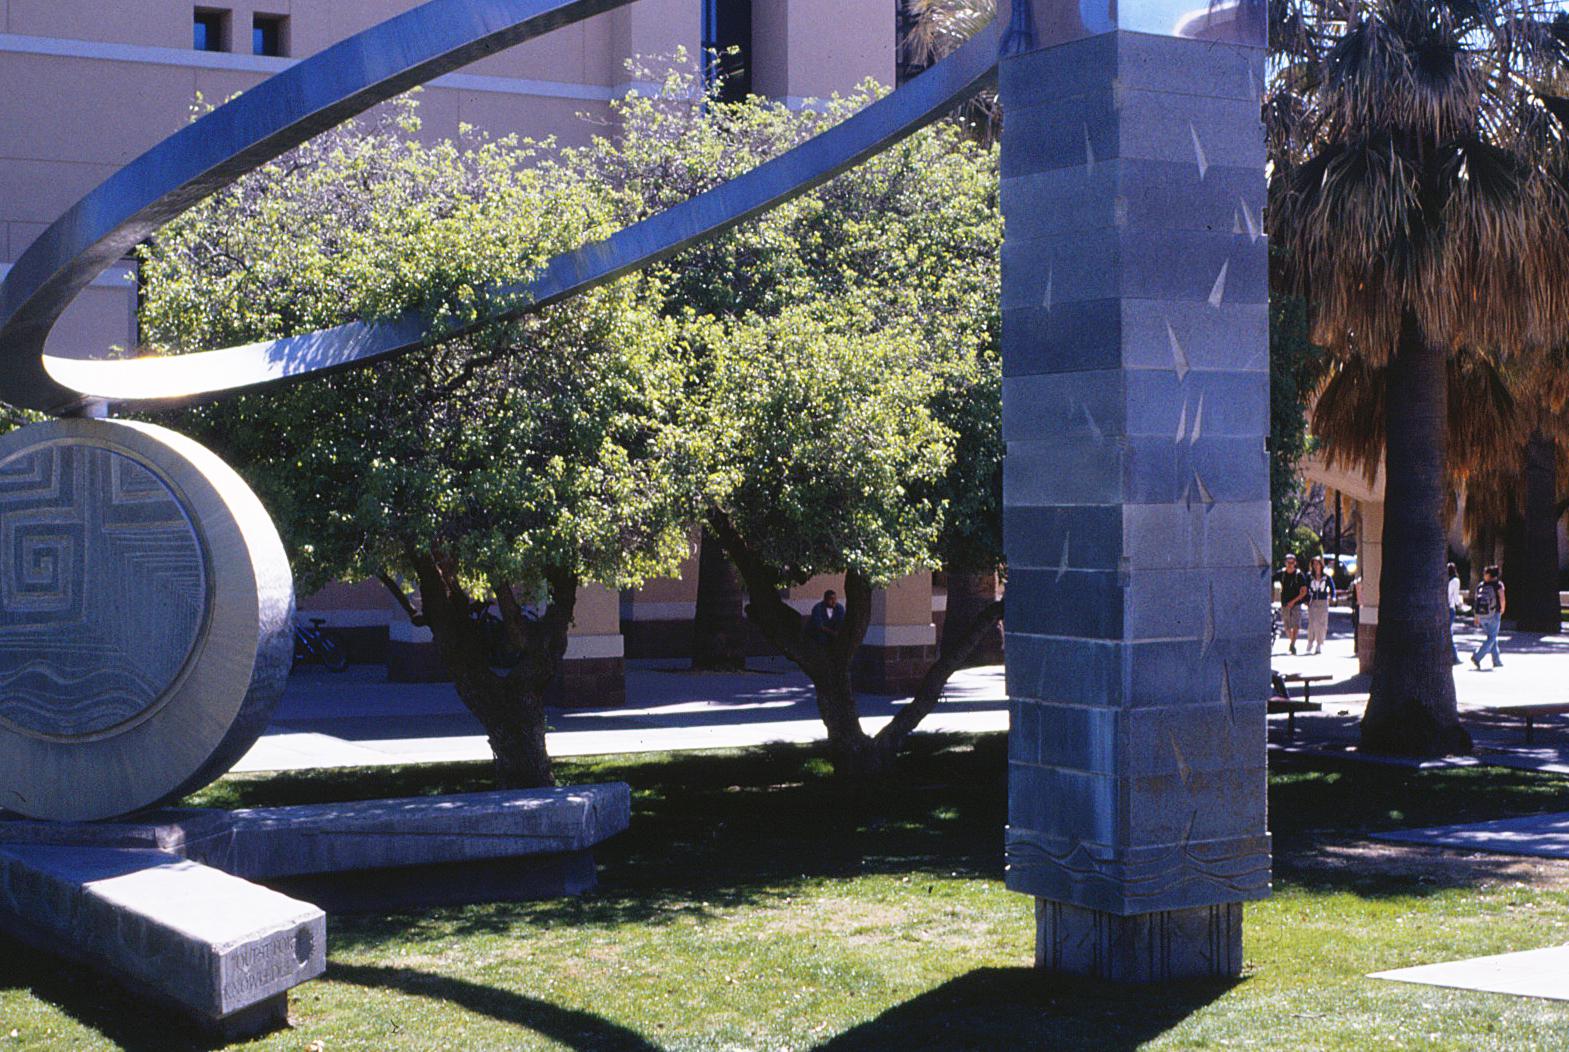 Public art at Zuhl library